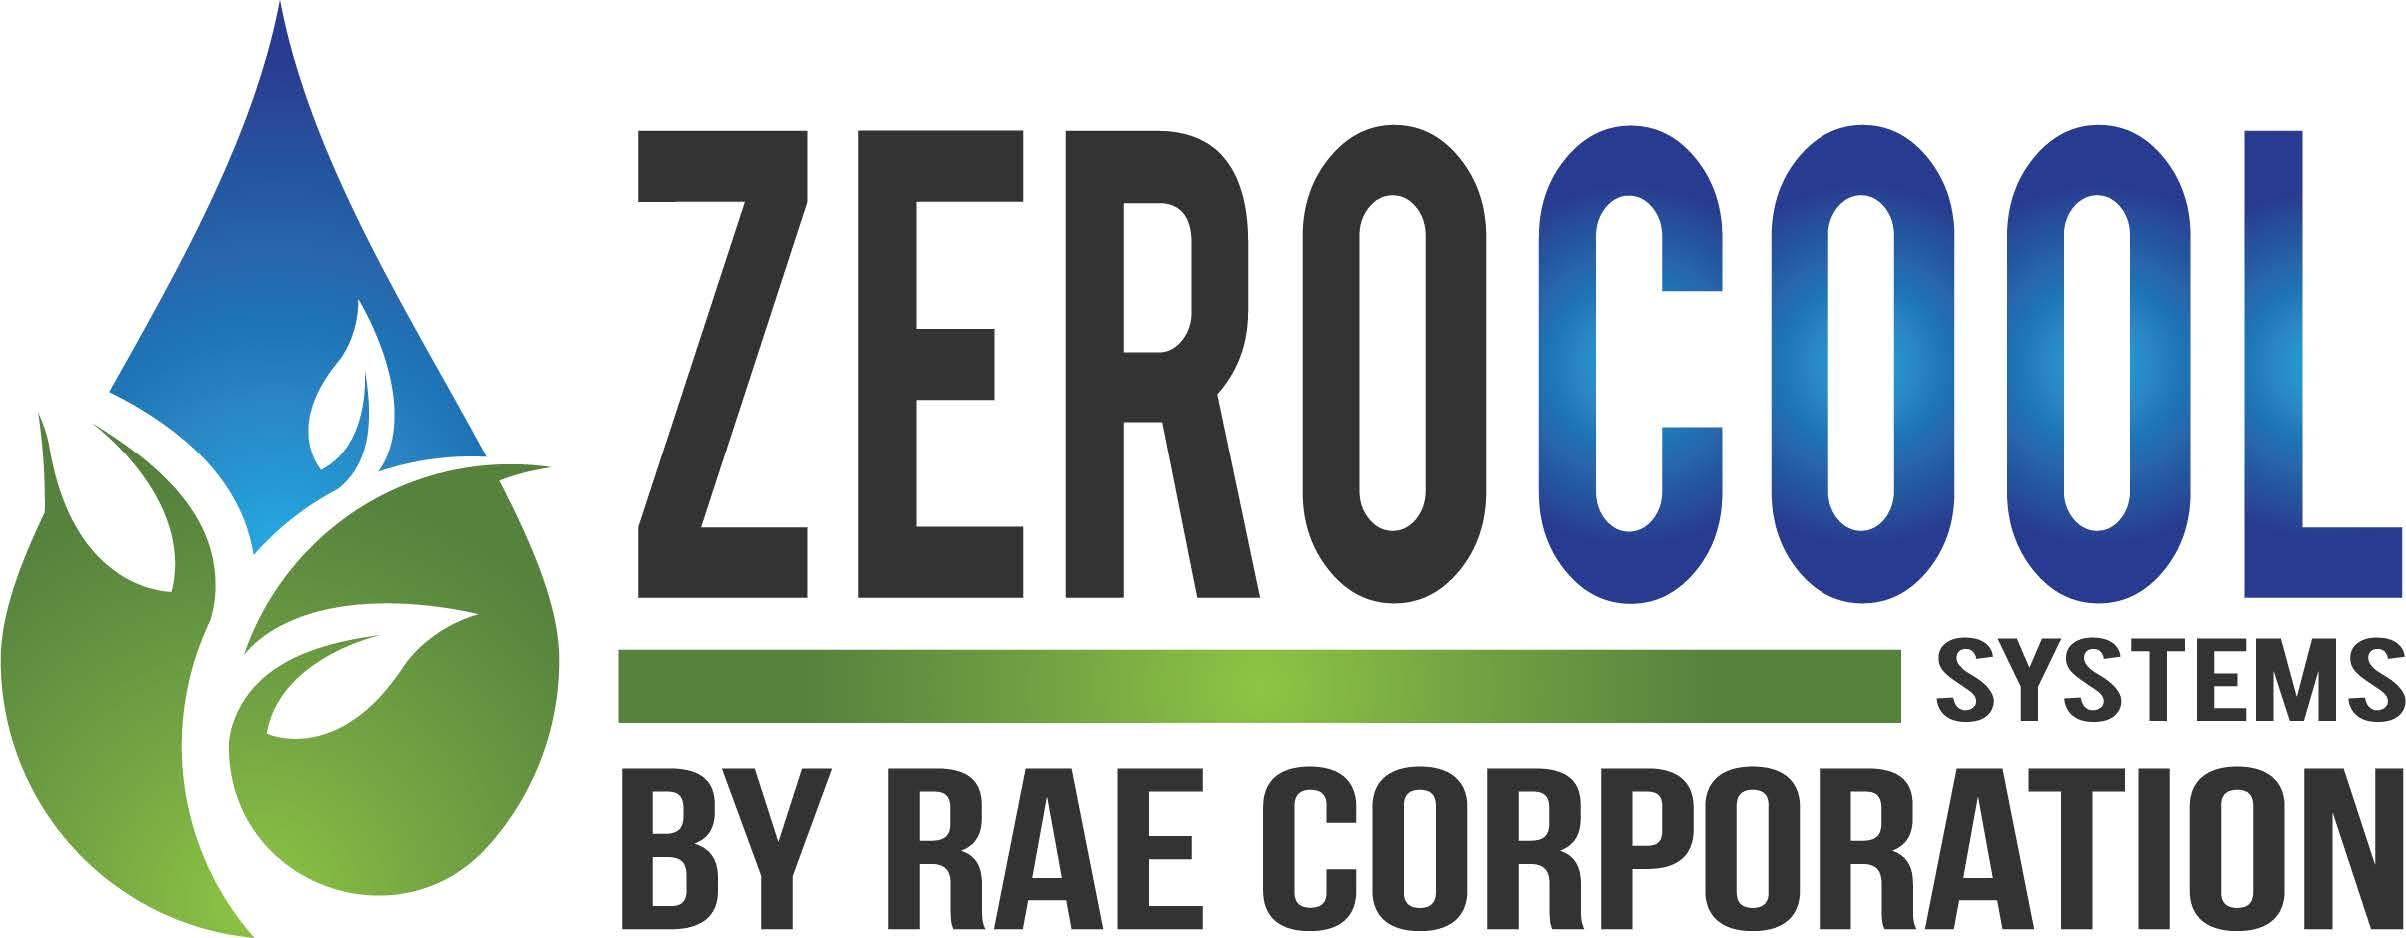 ZeroCool Systems